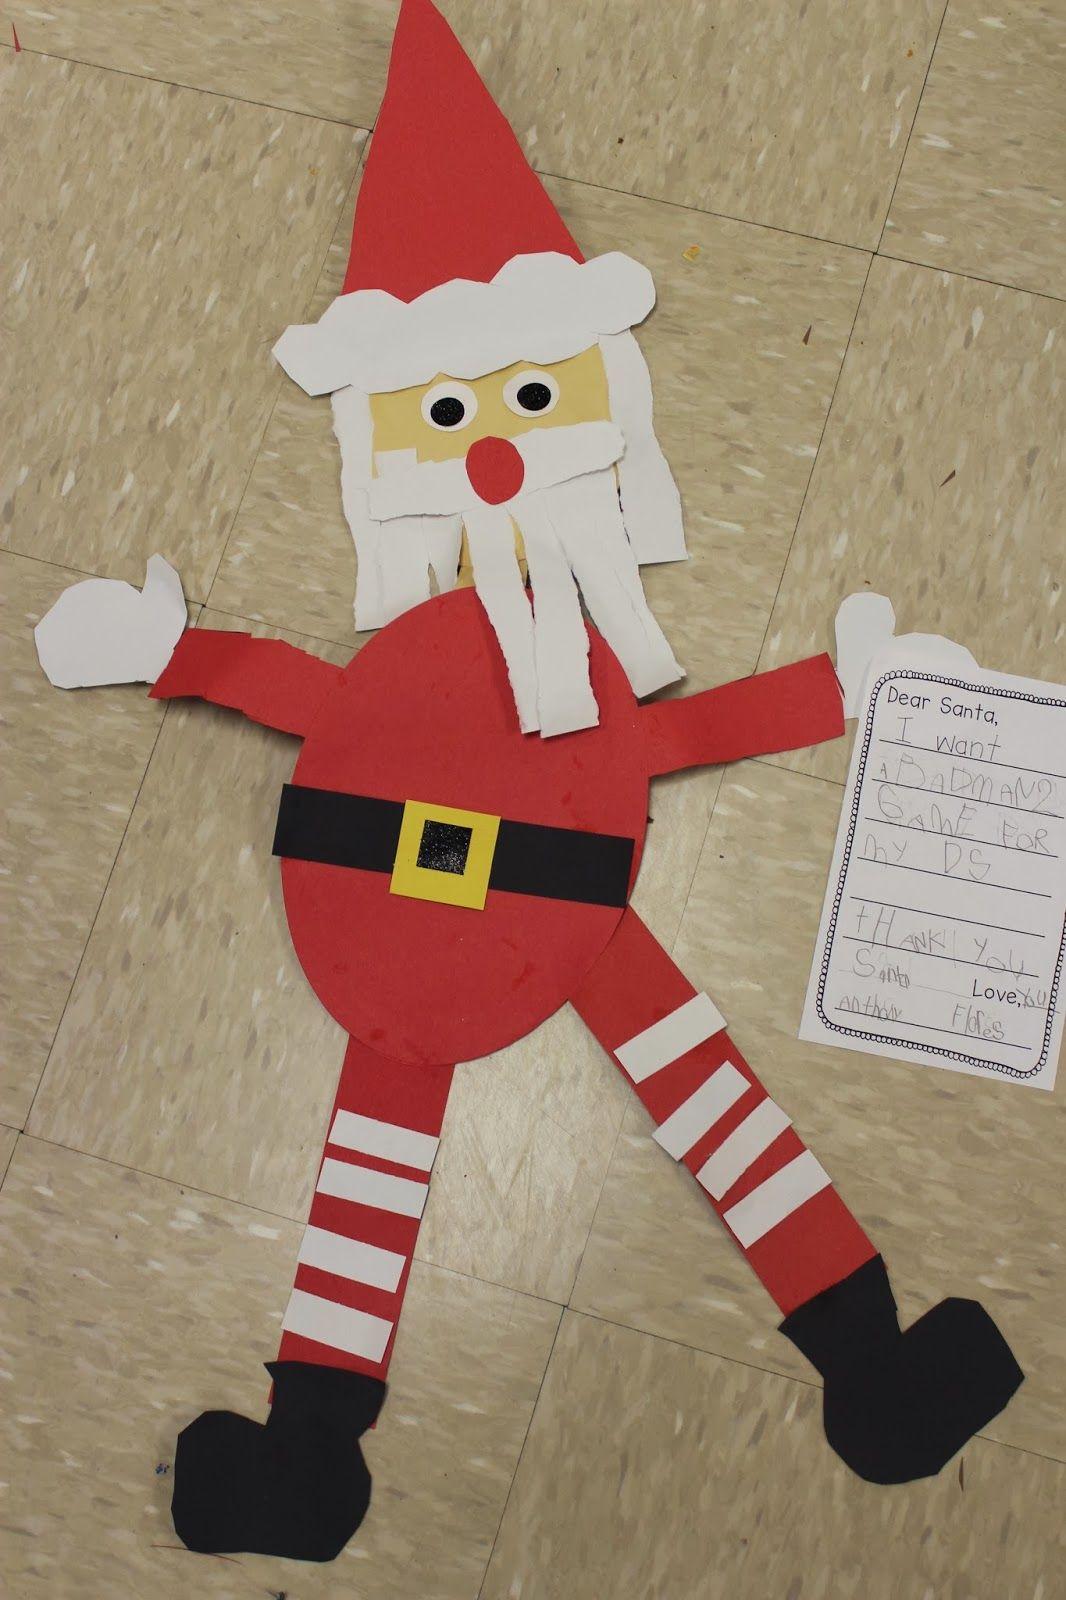 I love teaching using The Gingerbread Man! I always do it